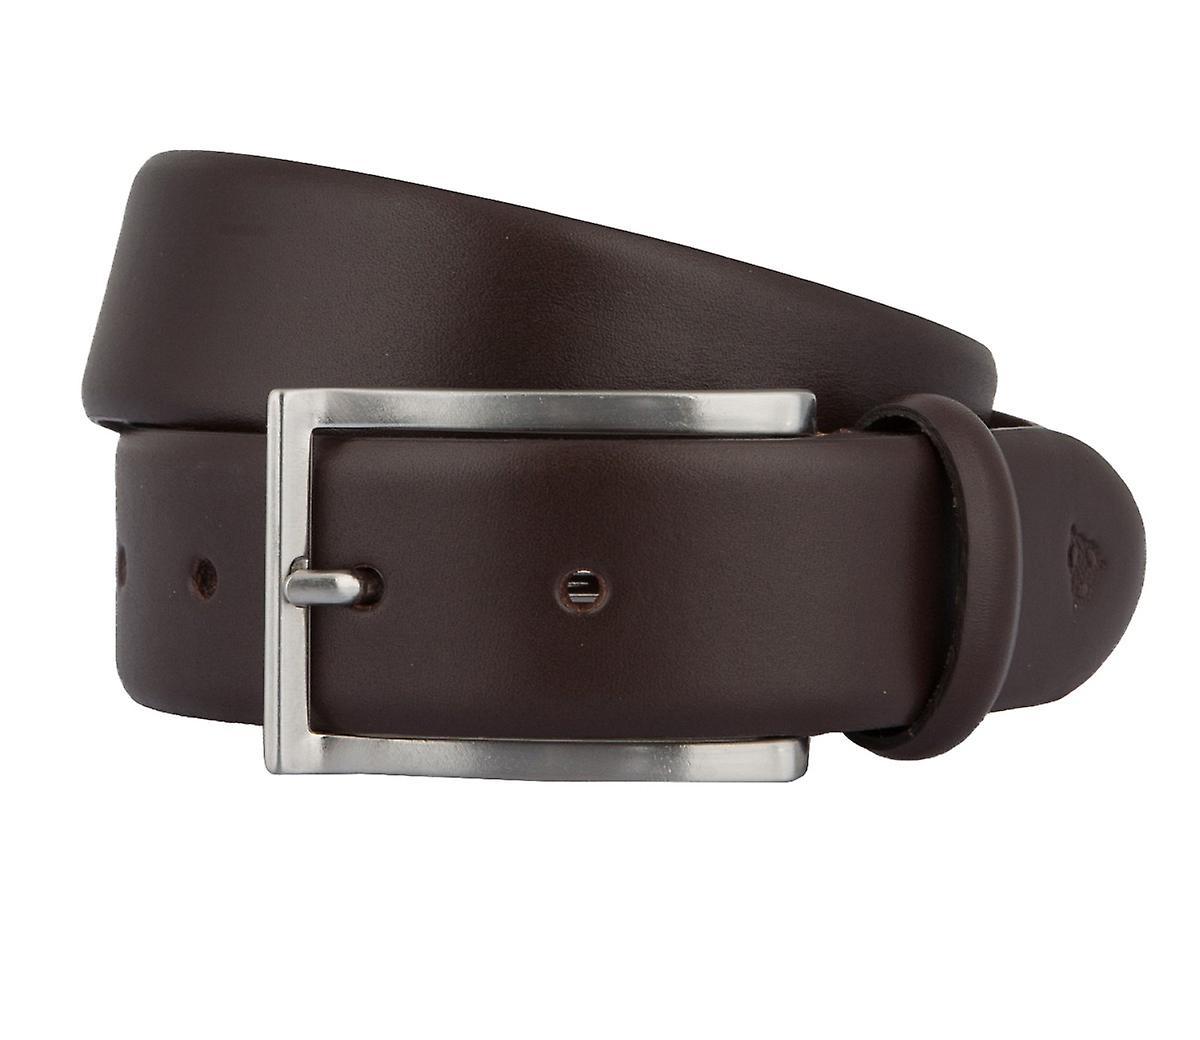 Ceinture en cuir ceintures ROY ROBSON ceintures hommes marron 2684